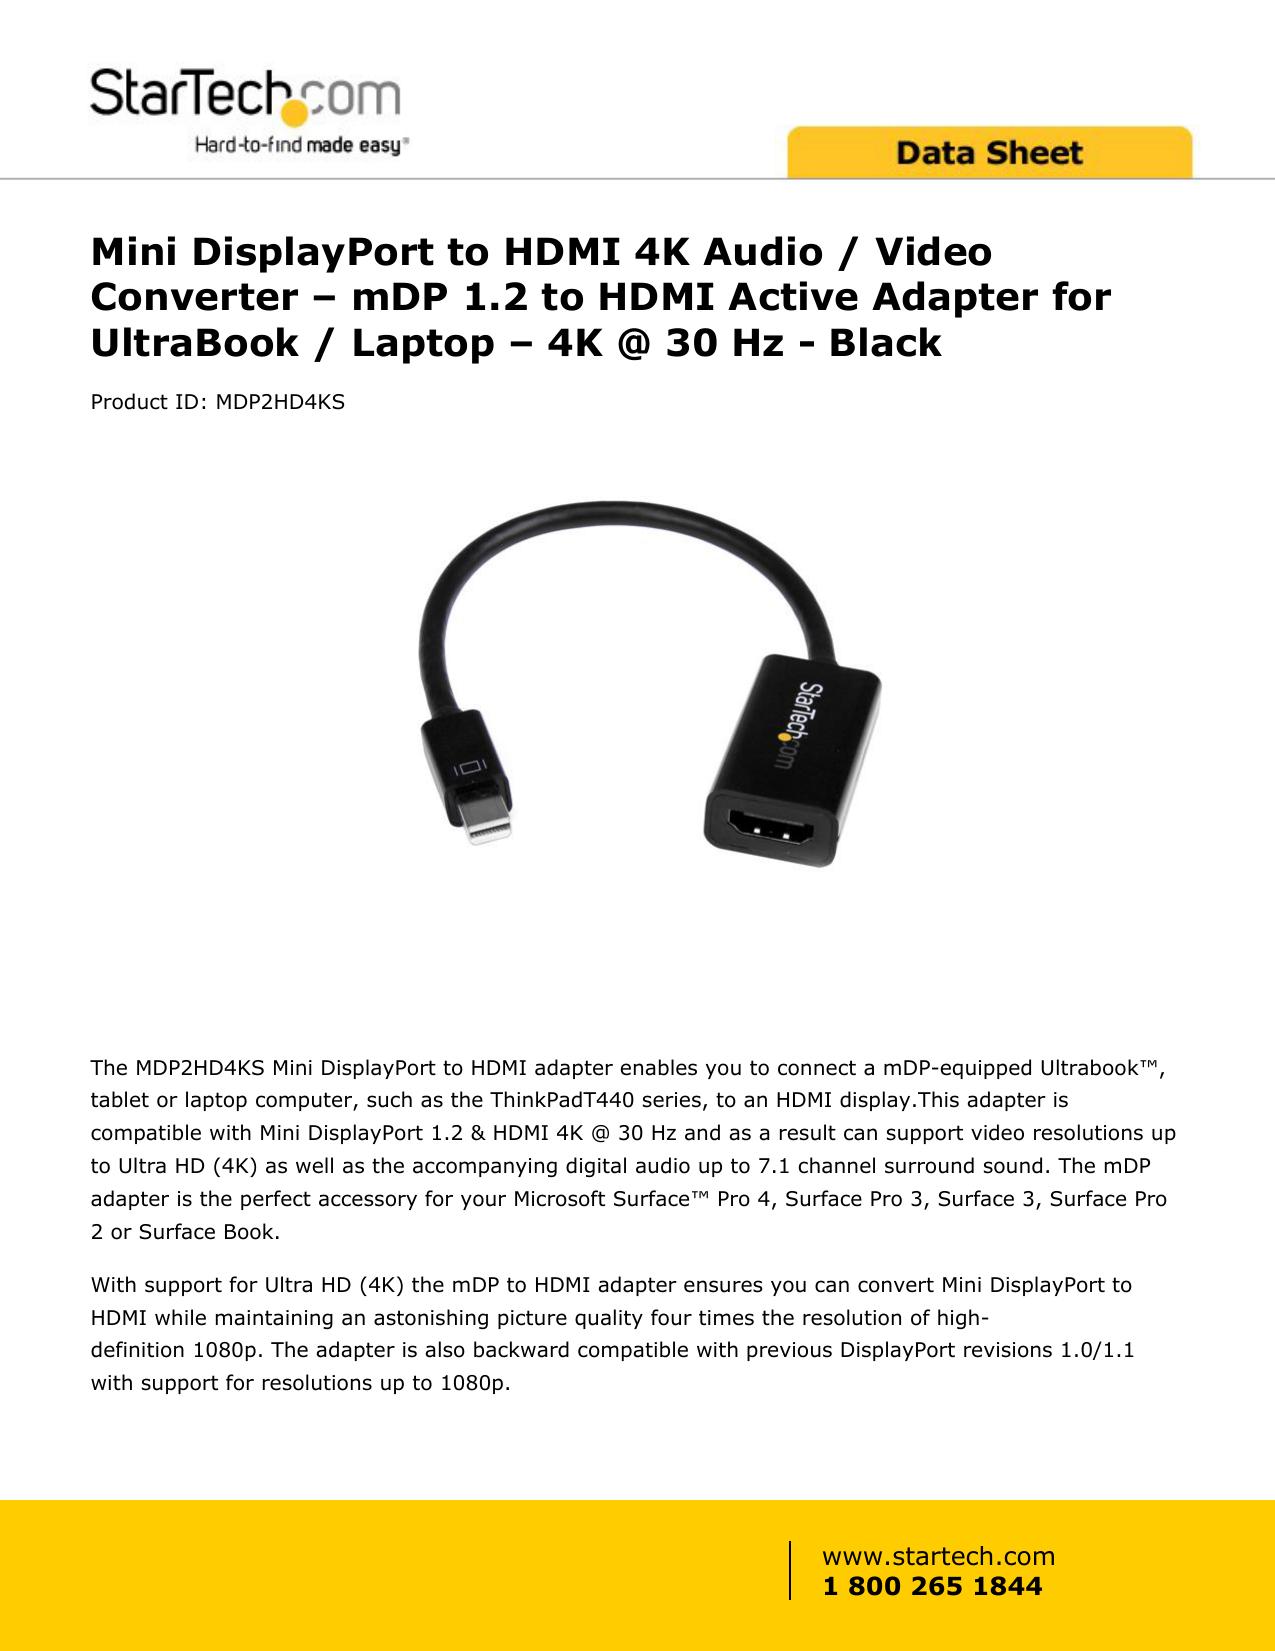 StarTech.com MDP2HD4KS Mini DisplayPort to HDMI Audio Video Converter